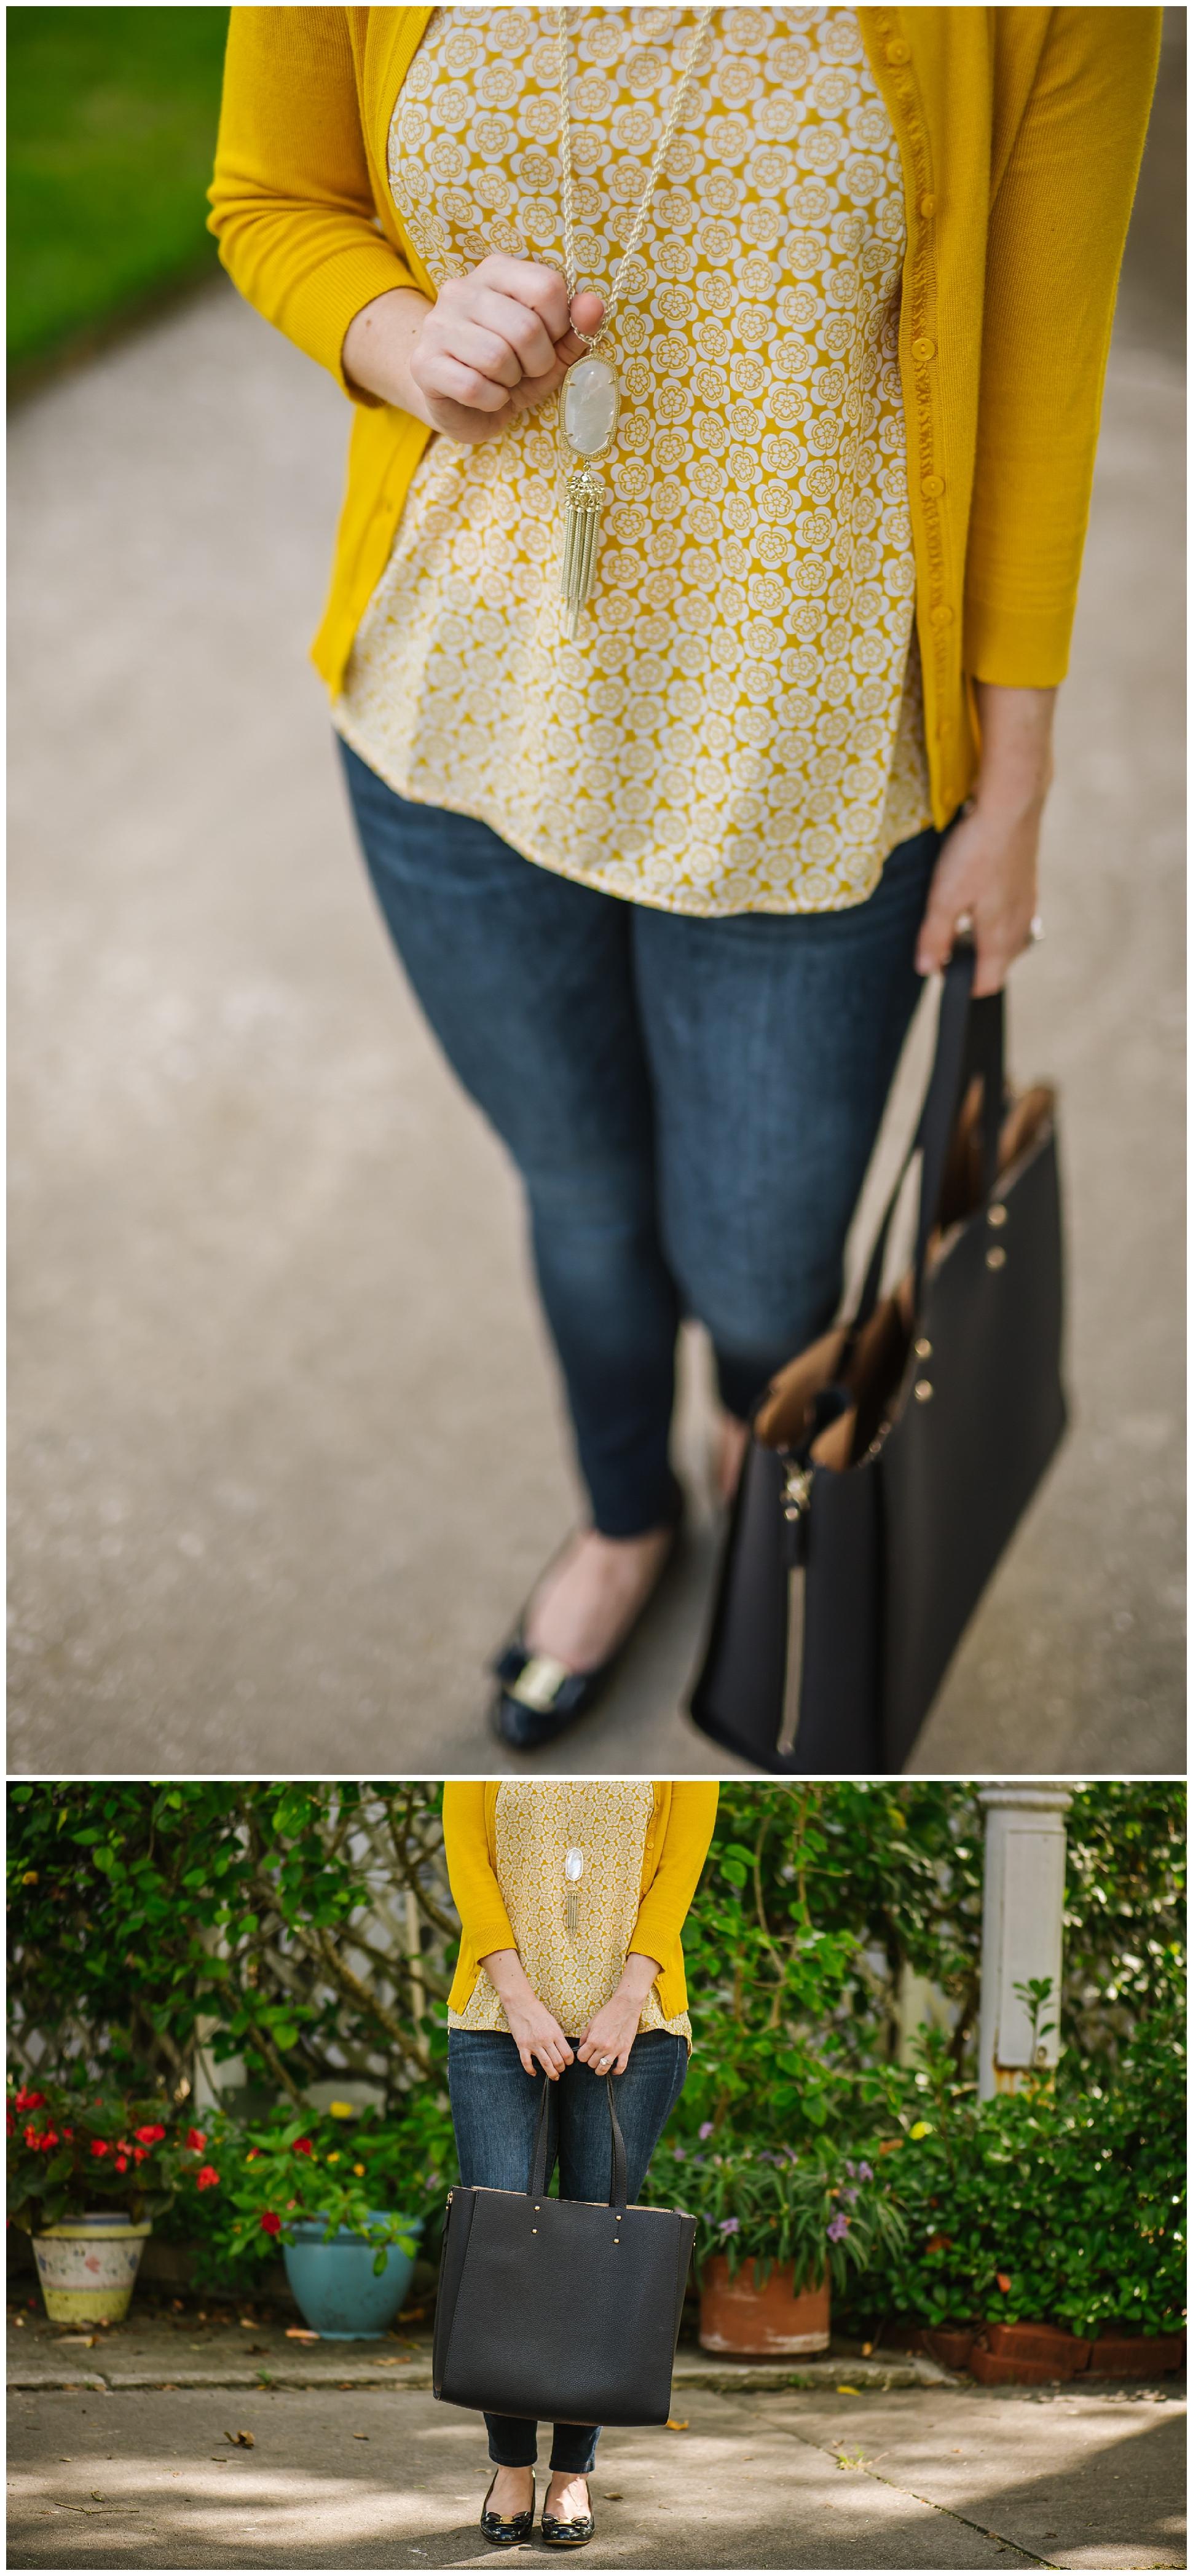 Tampa-lifestyle-bradning-fashion-blogger-photographer_0029.jpg